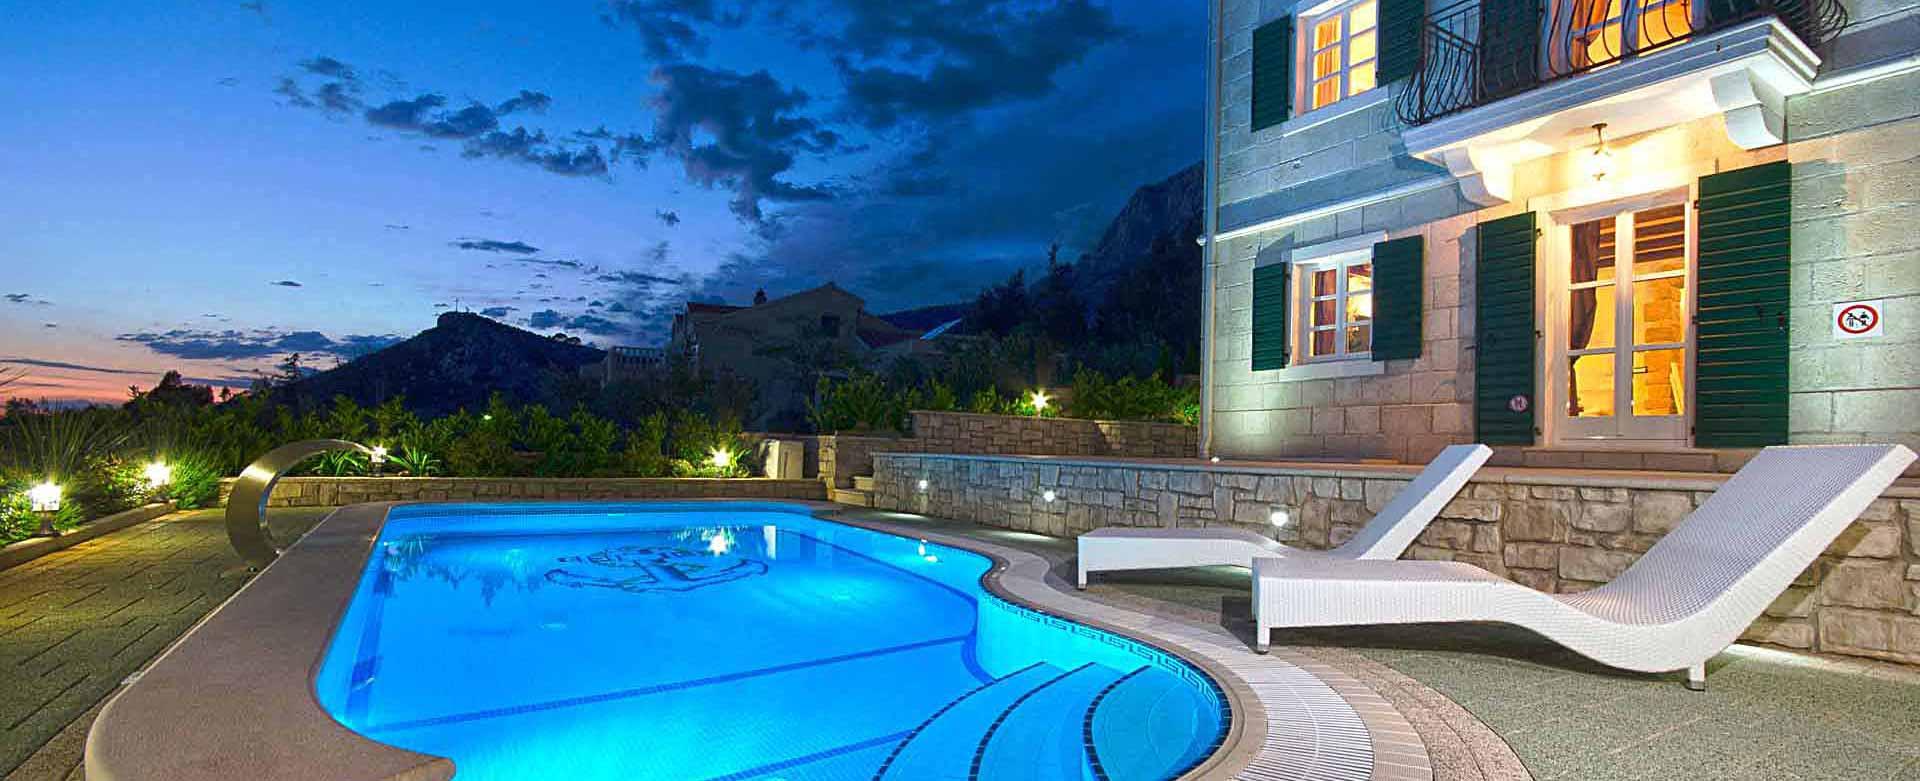 Ferienhaus makarska mit pool for Kroatien villa mit pool